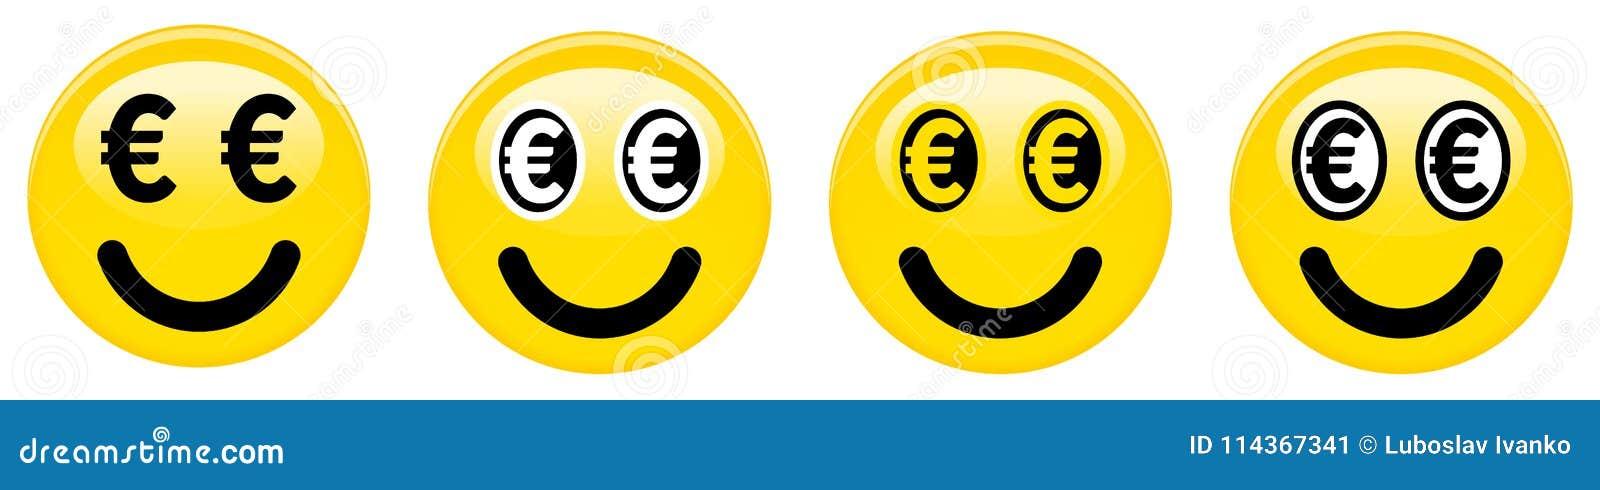 Euro Smiley Emoticon Yellow 3d Emoji With Black And White Euro